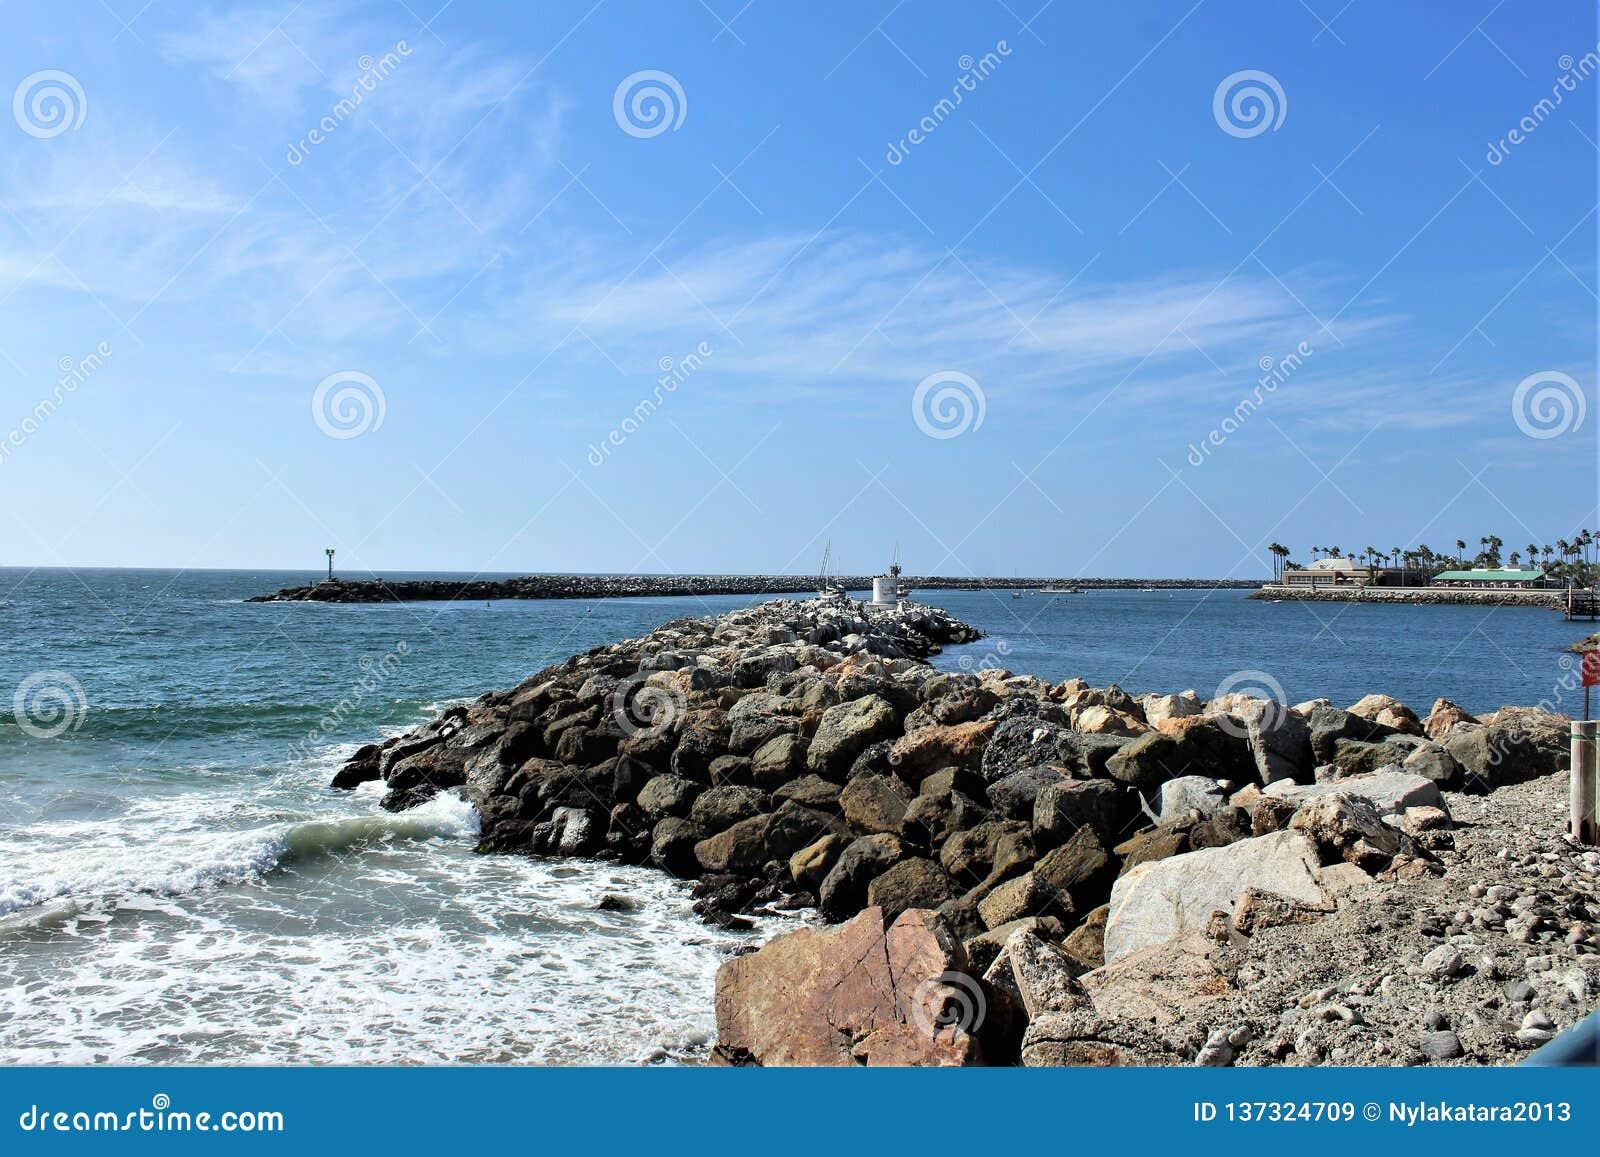 Scenic oceanside view of Portifino California ocean side in Redondo Beach, California, United States